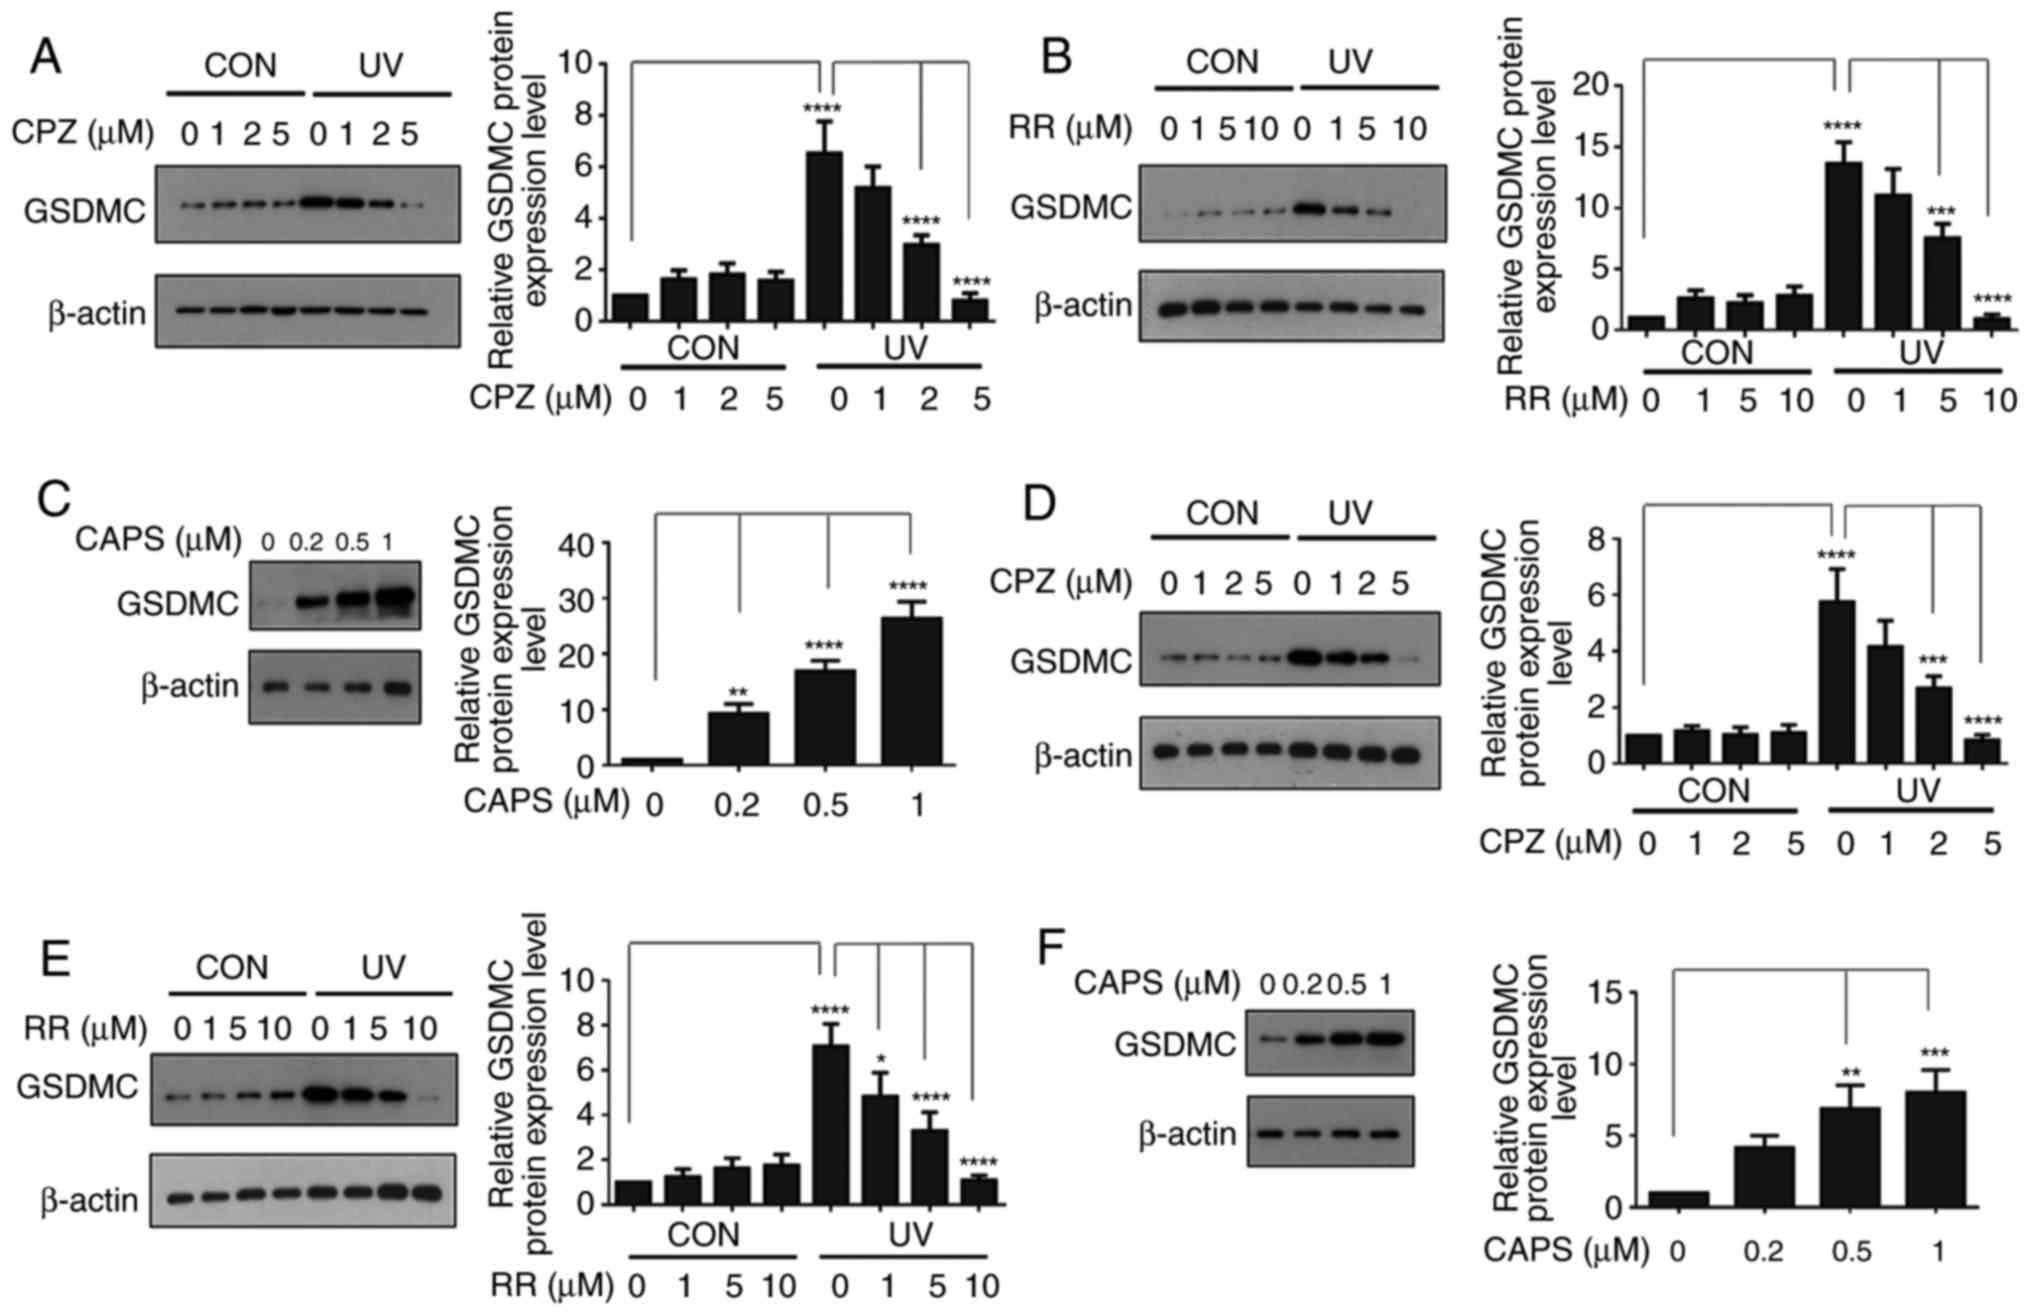 Ultraviolet light-induced gasdermin C expression is mediated via